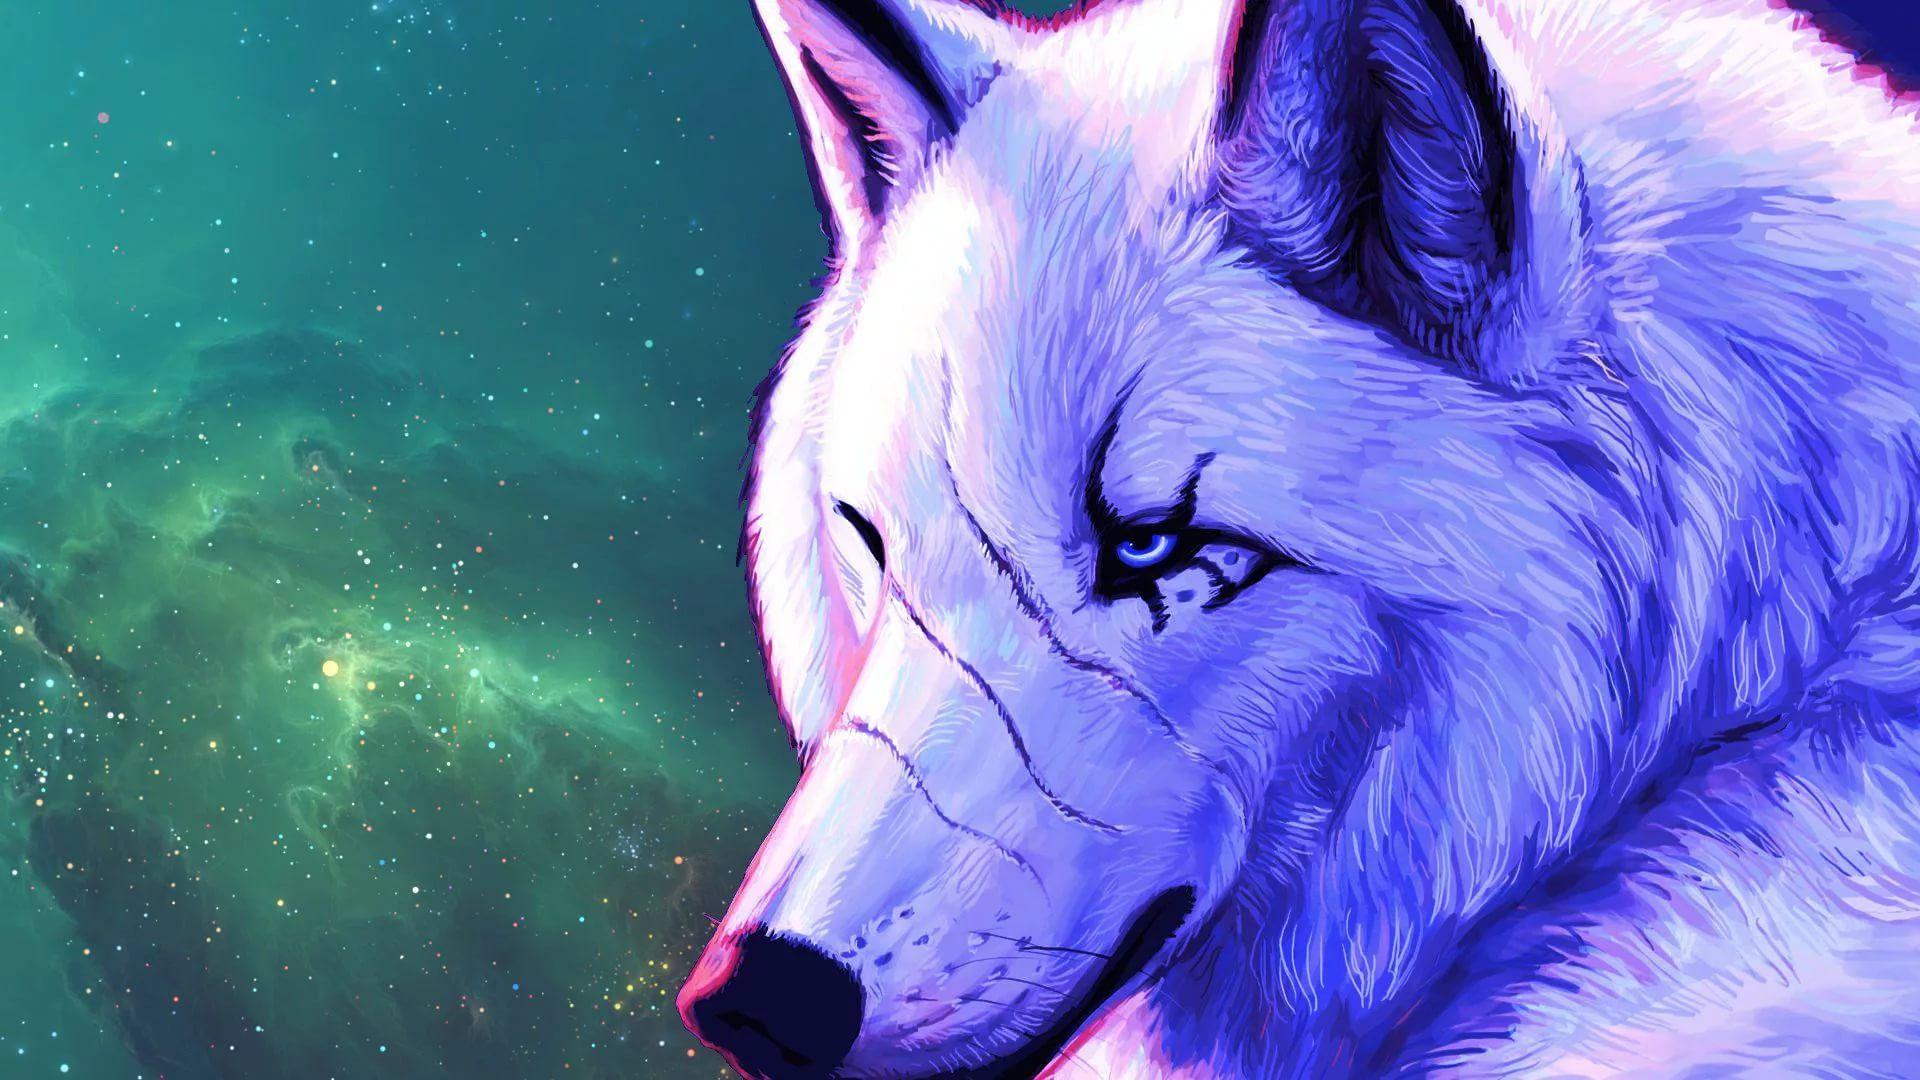 Cool Wolf full wallpaper